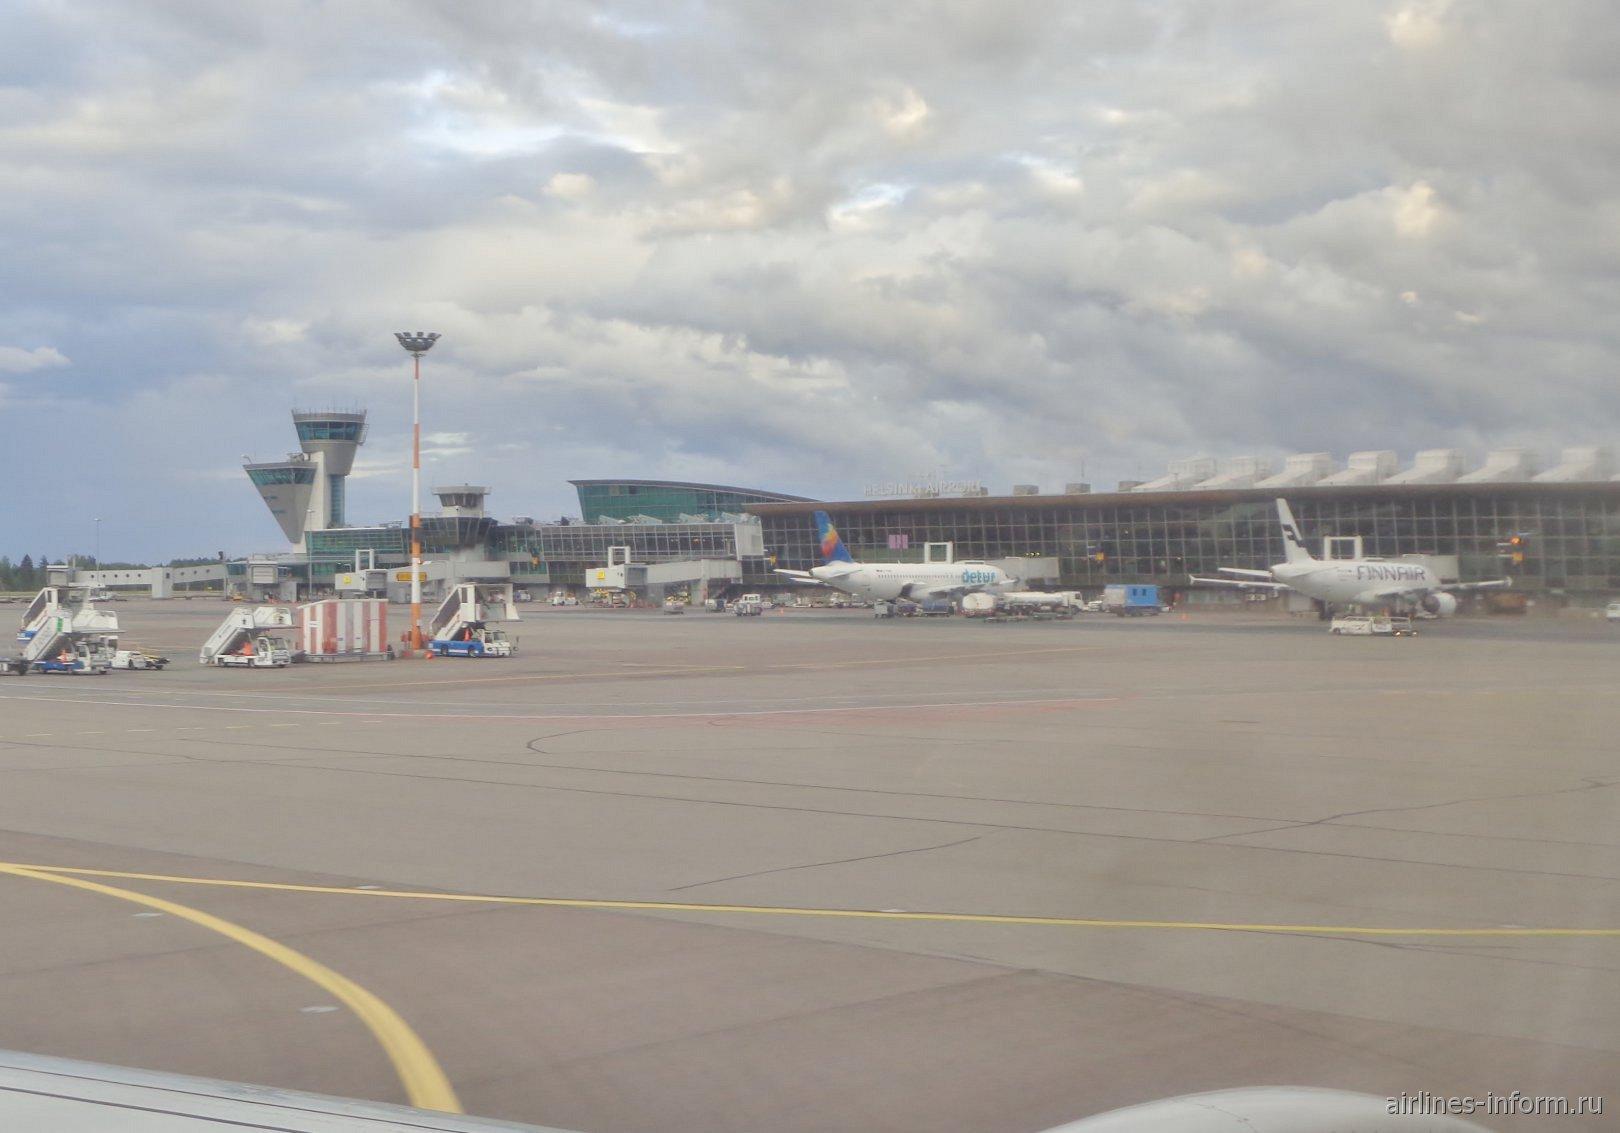 Терминал 2 аэропорта Хельсинки-Вантаа